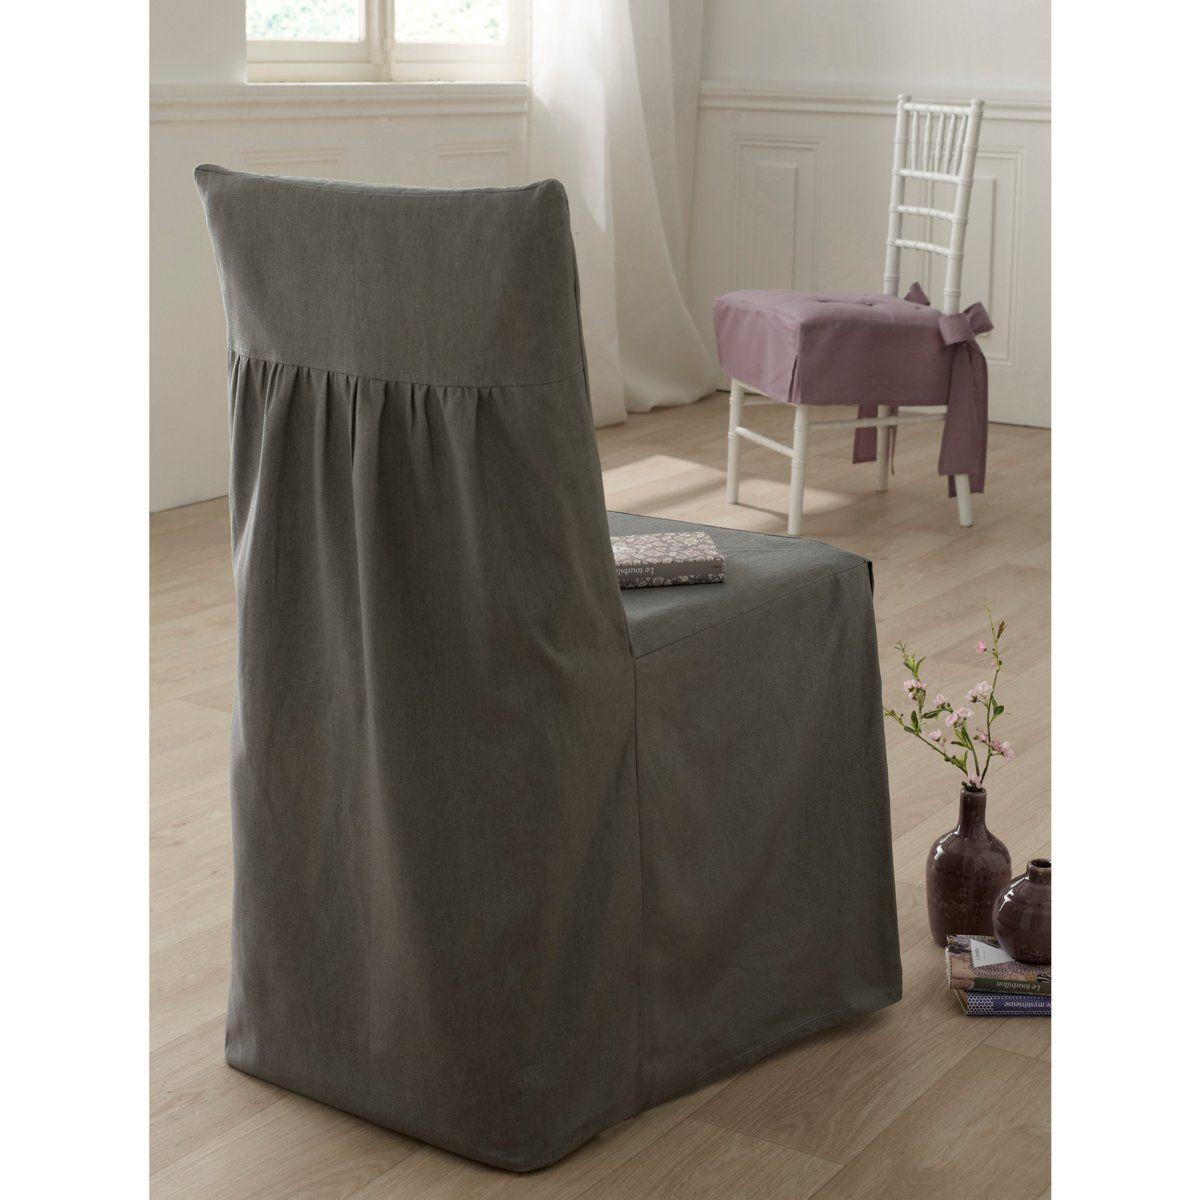 utilizar fundas de tela para renovar o decorar las sillas | fundas ...